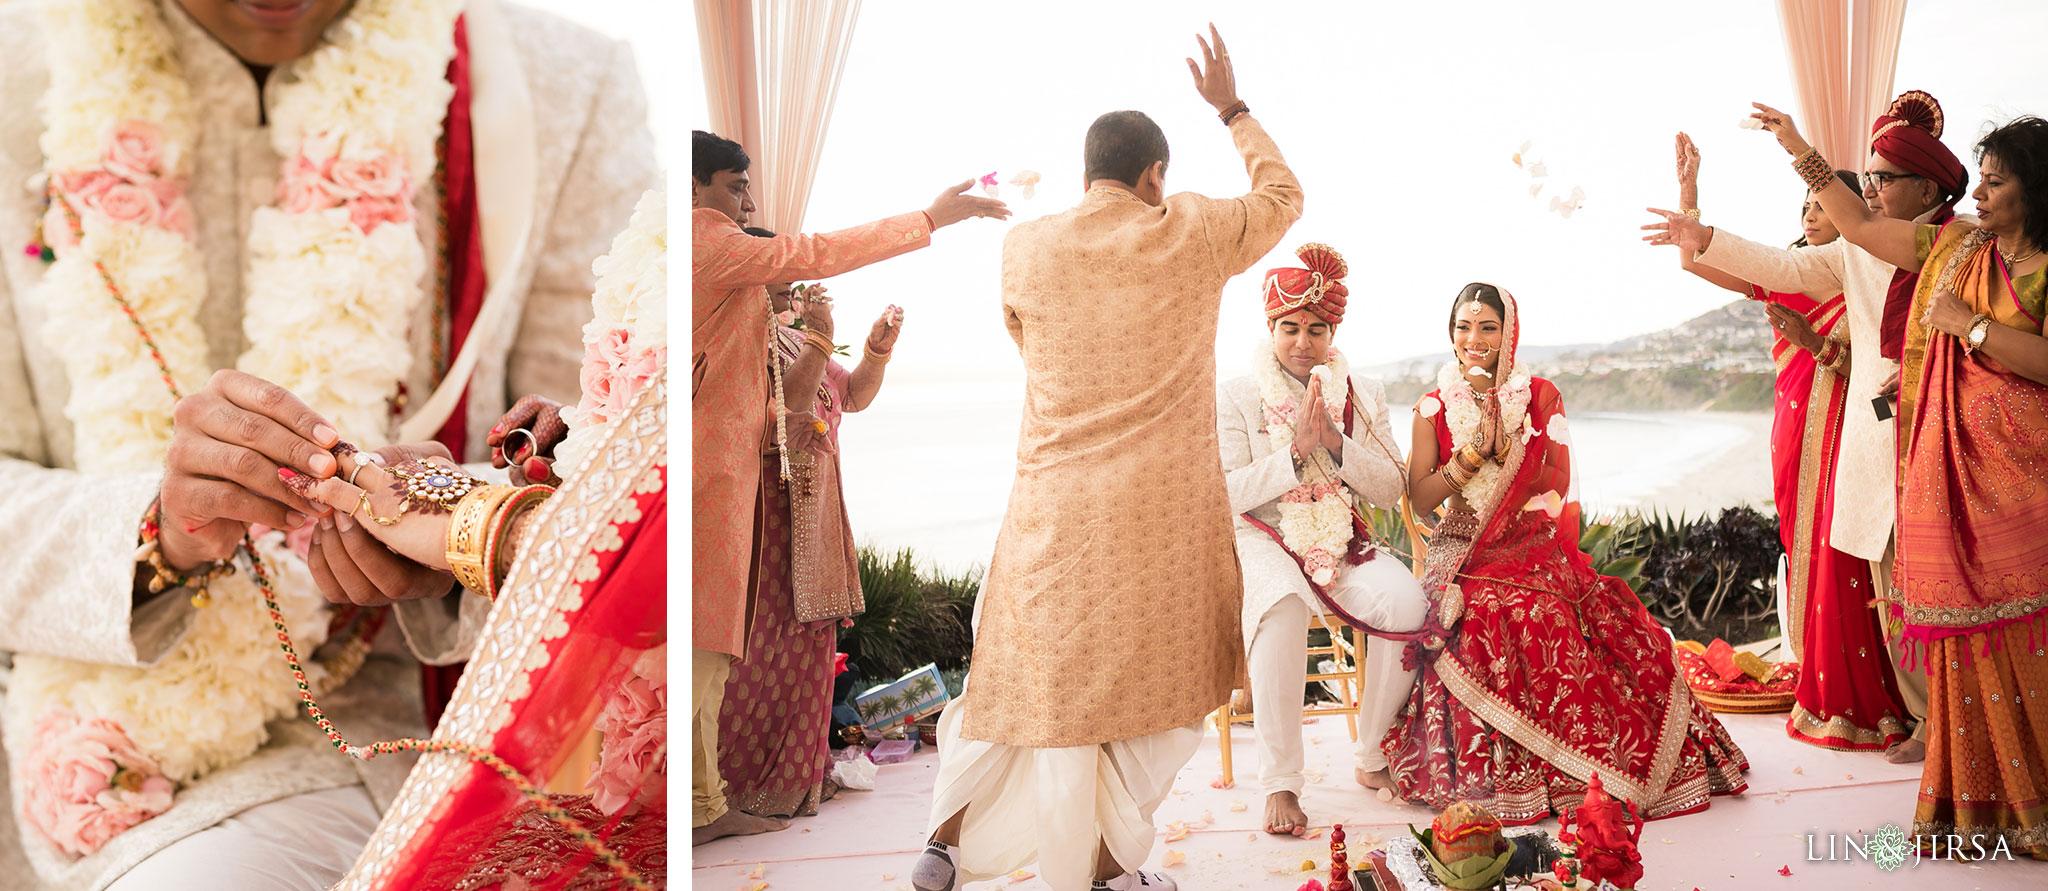 28 ritz carlton laguna niguel indian wedding ceremony photography